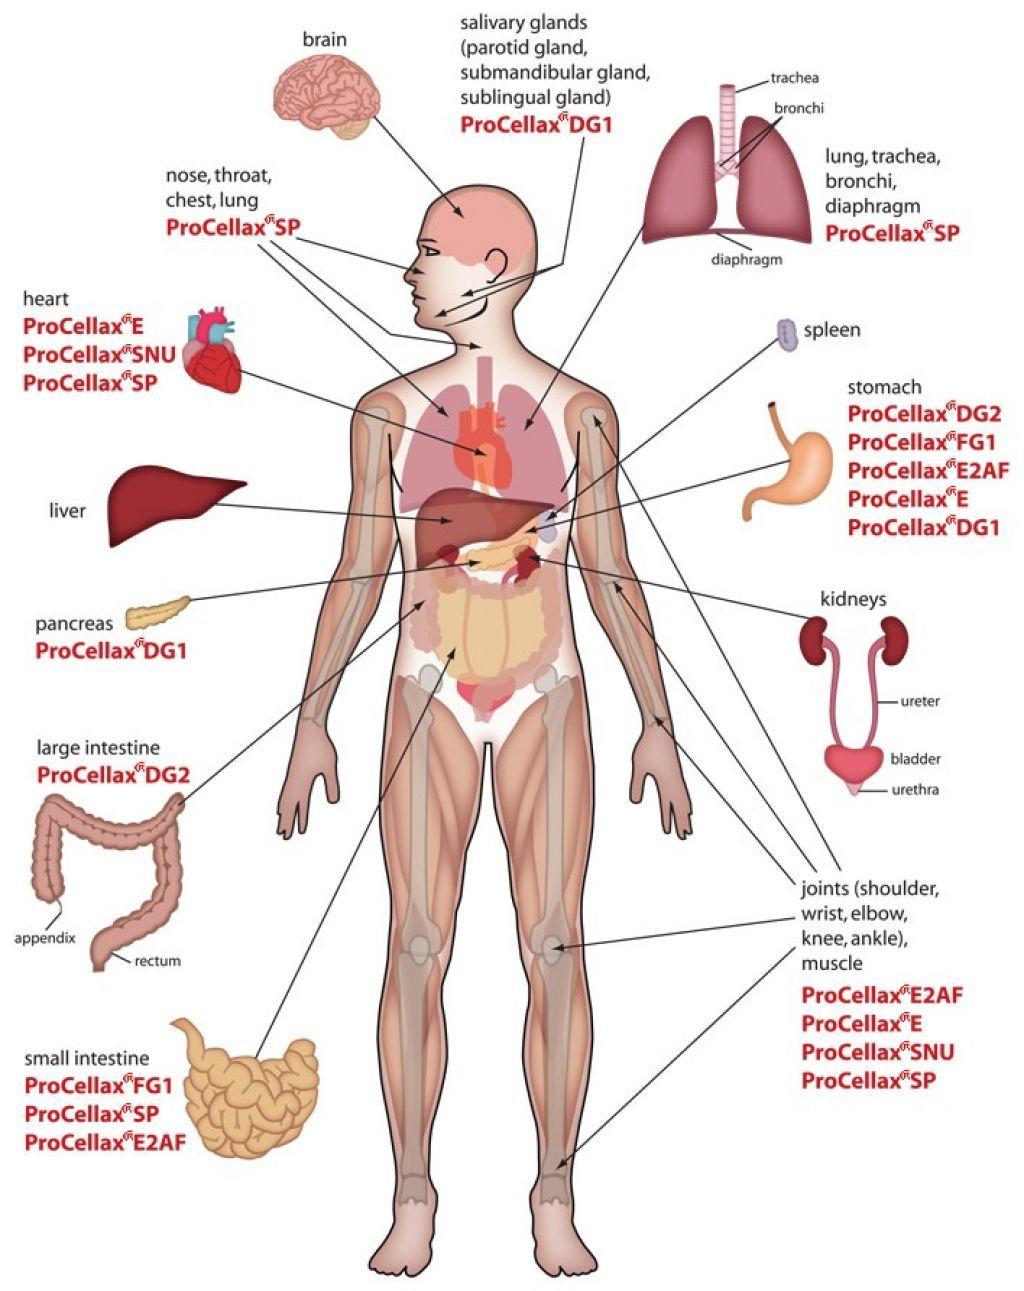 Human internal organs diagram clipart image royalty free stock Human Body Anatomy Internal Organs Diagram   Stay Fit and Strong ... image royalty free stock